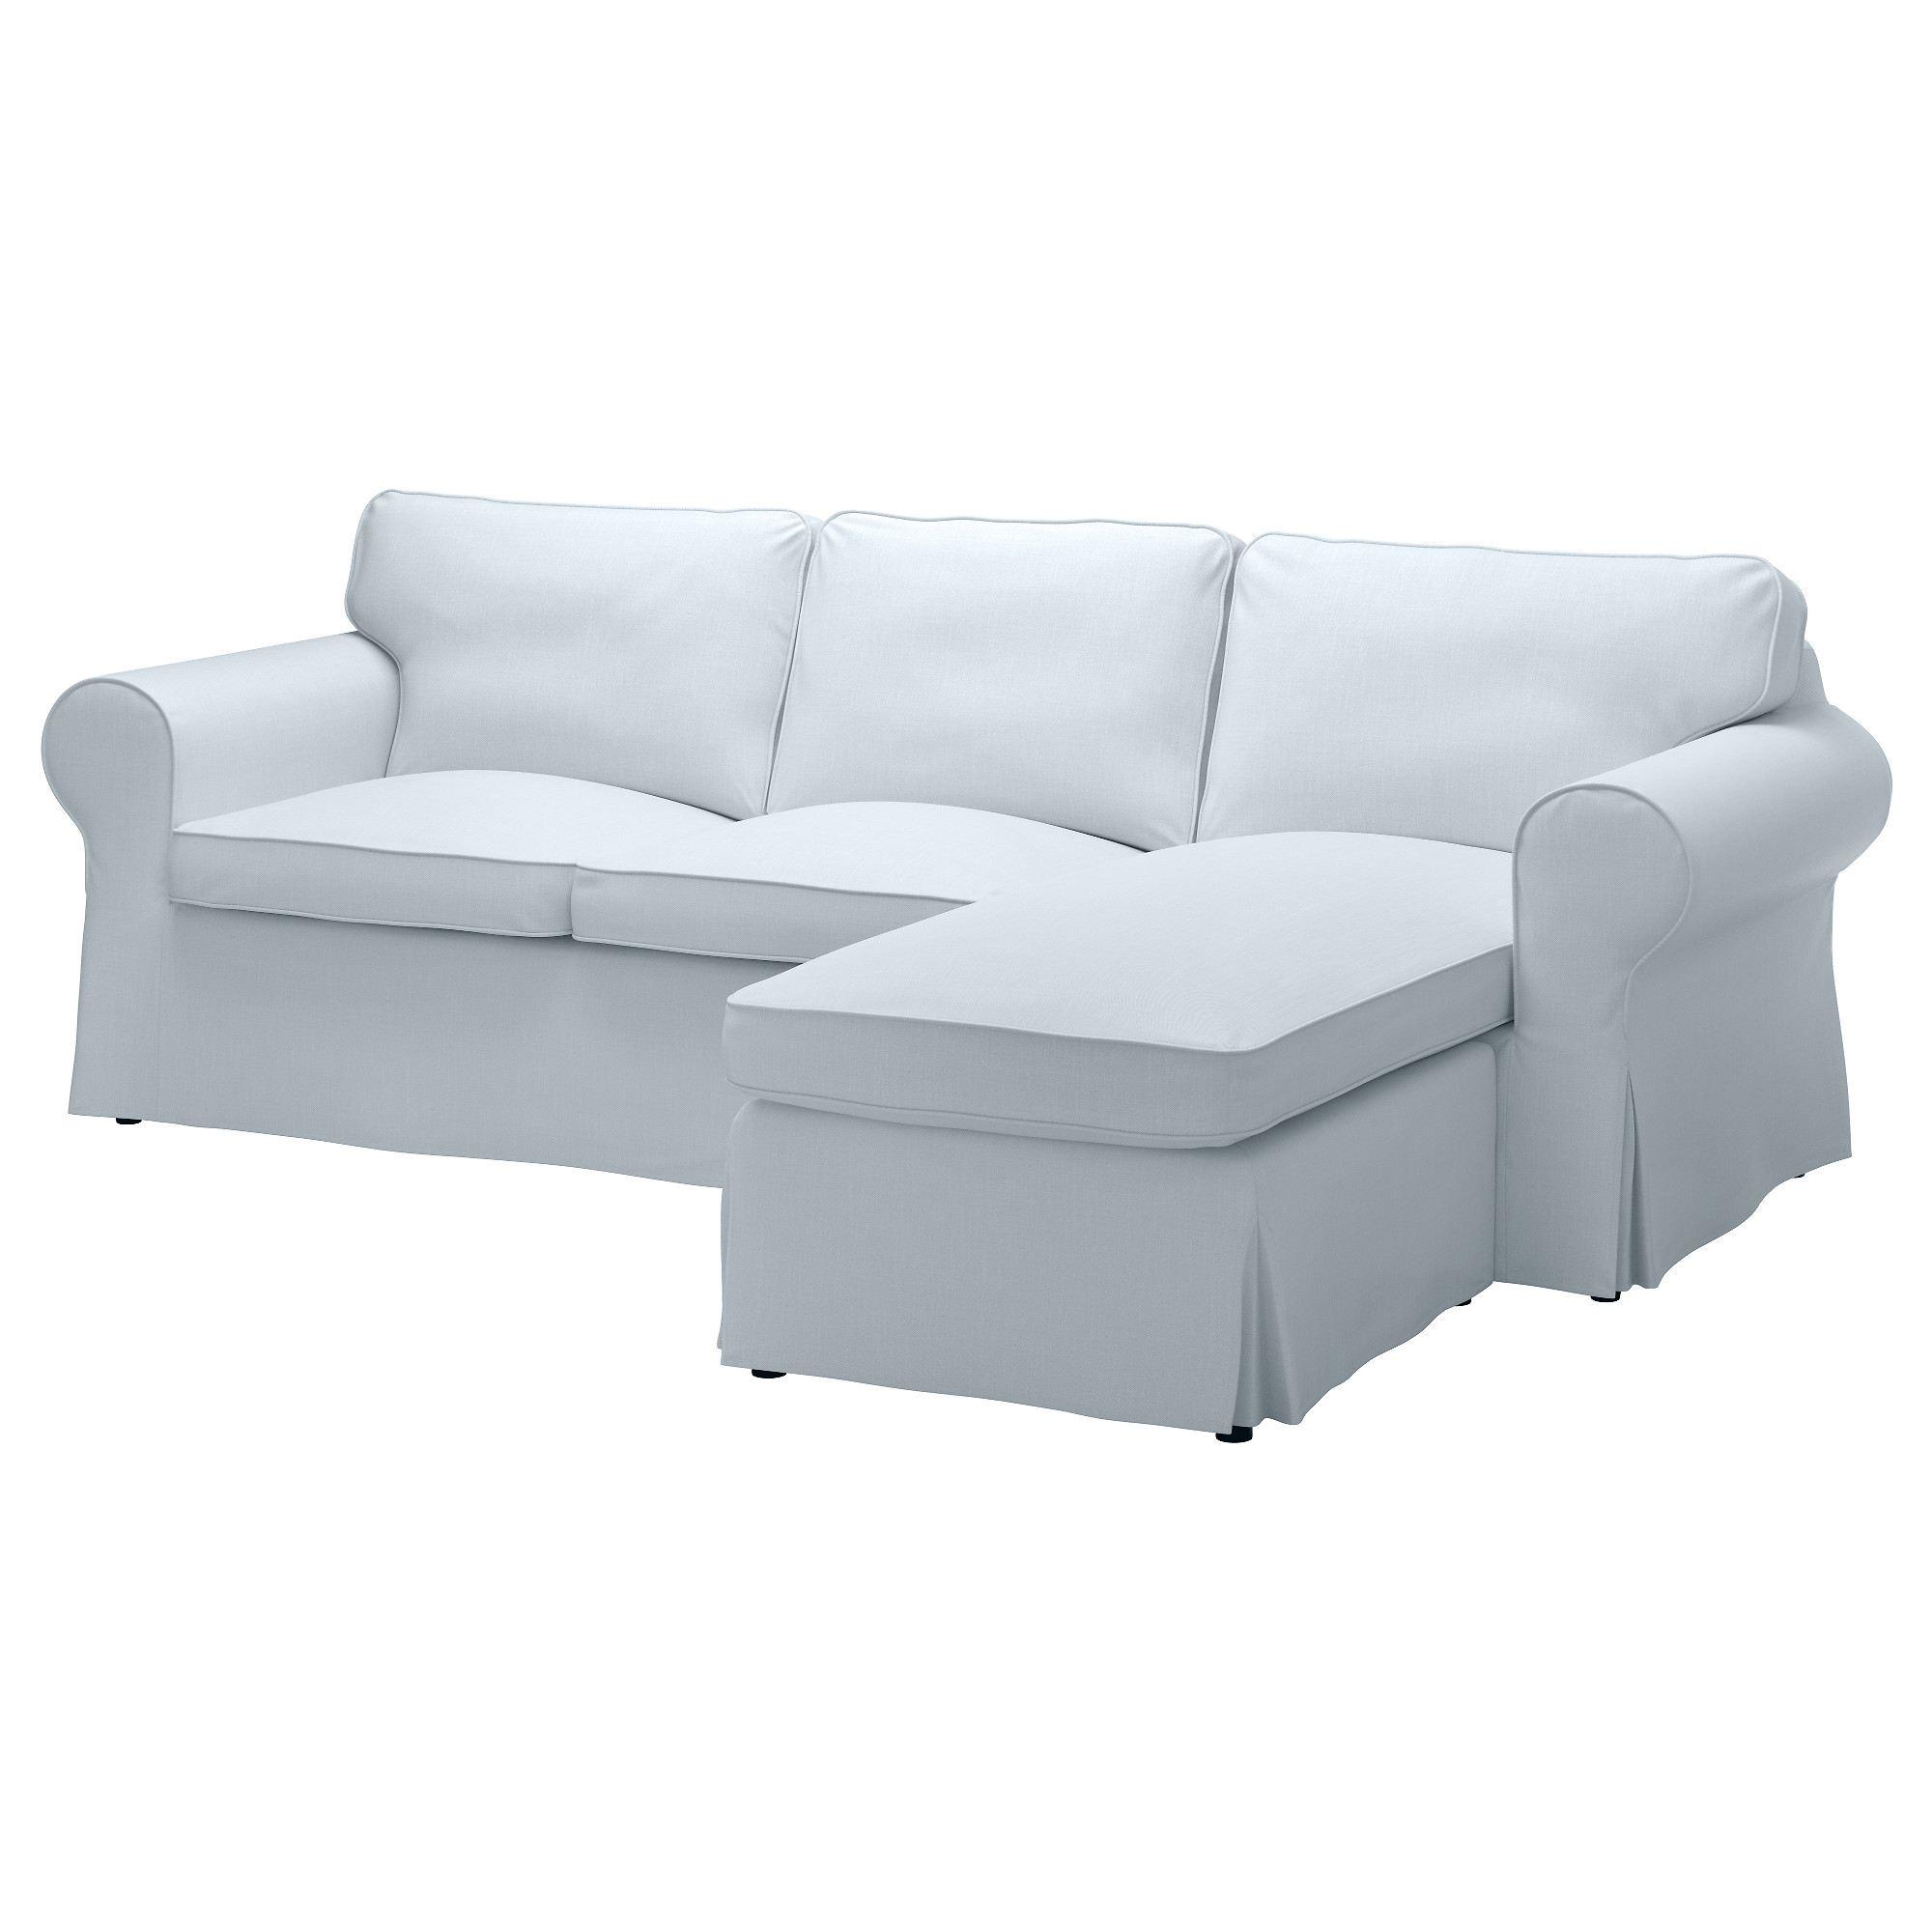 The Best Slipcovered Sofas Of 2020